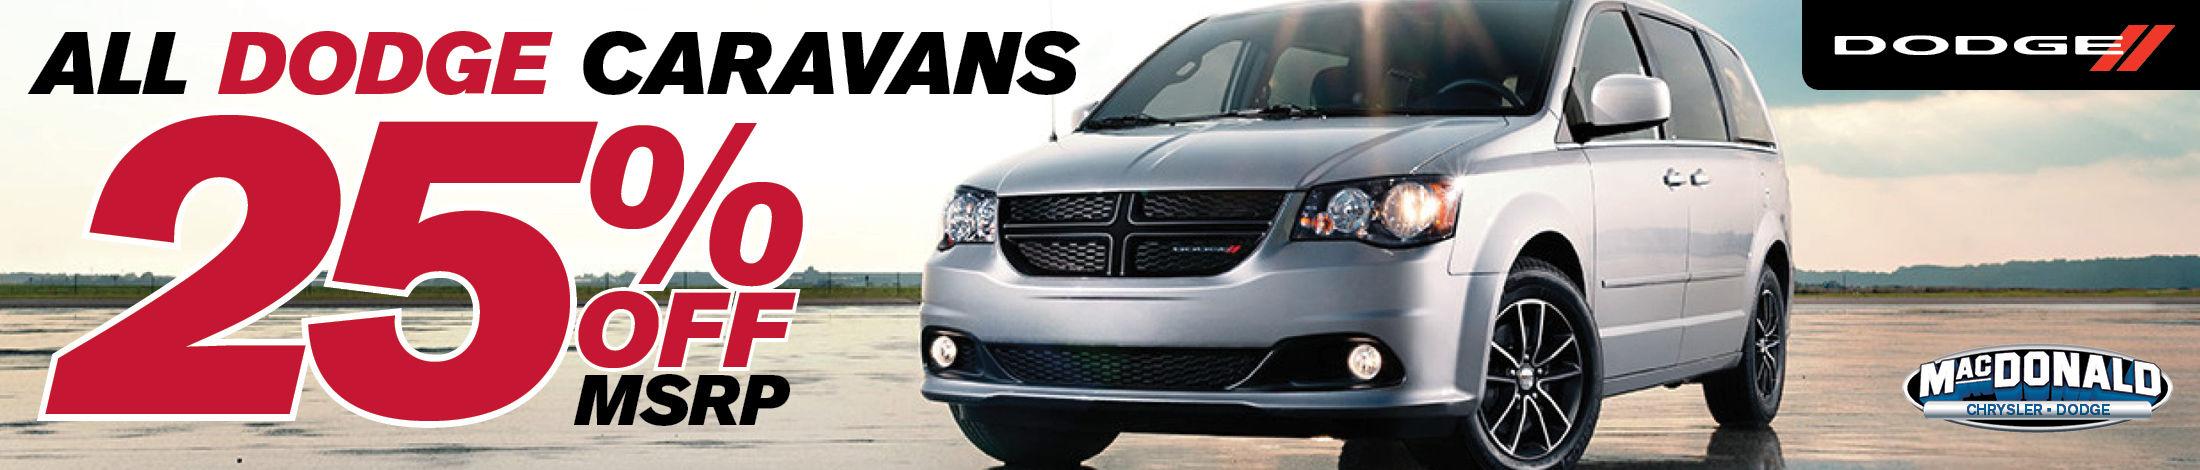 Dodge Caravan Promo July